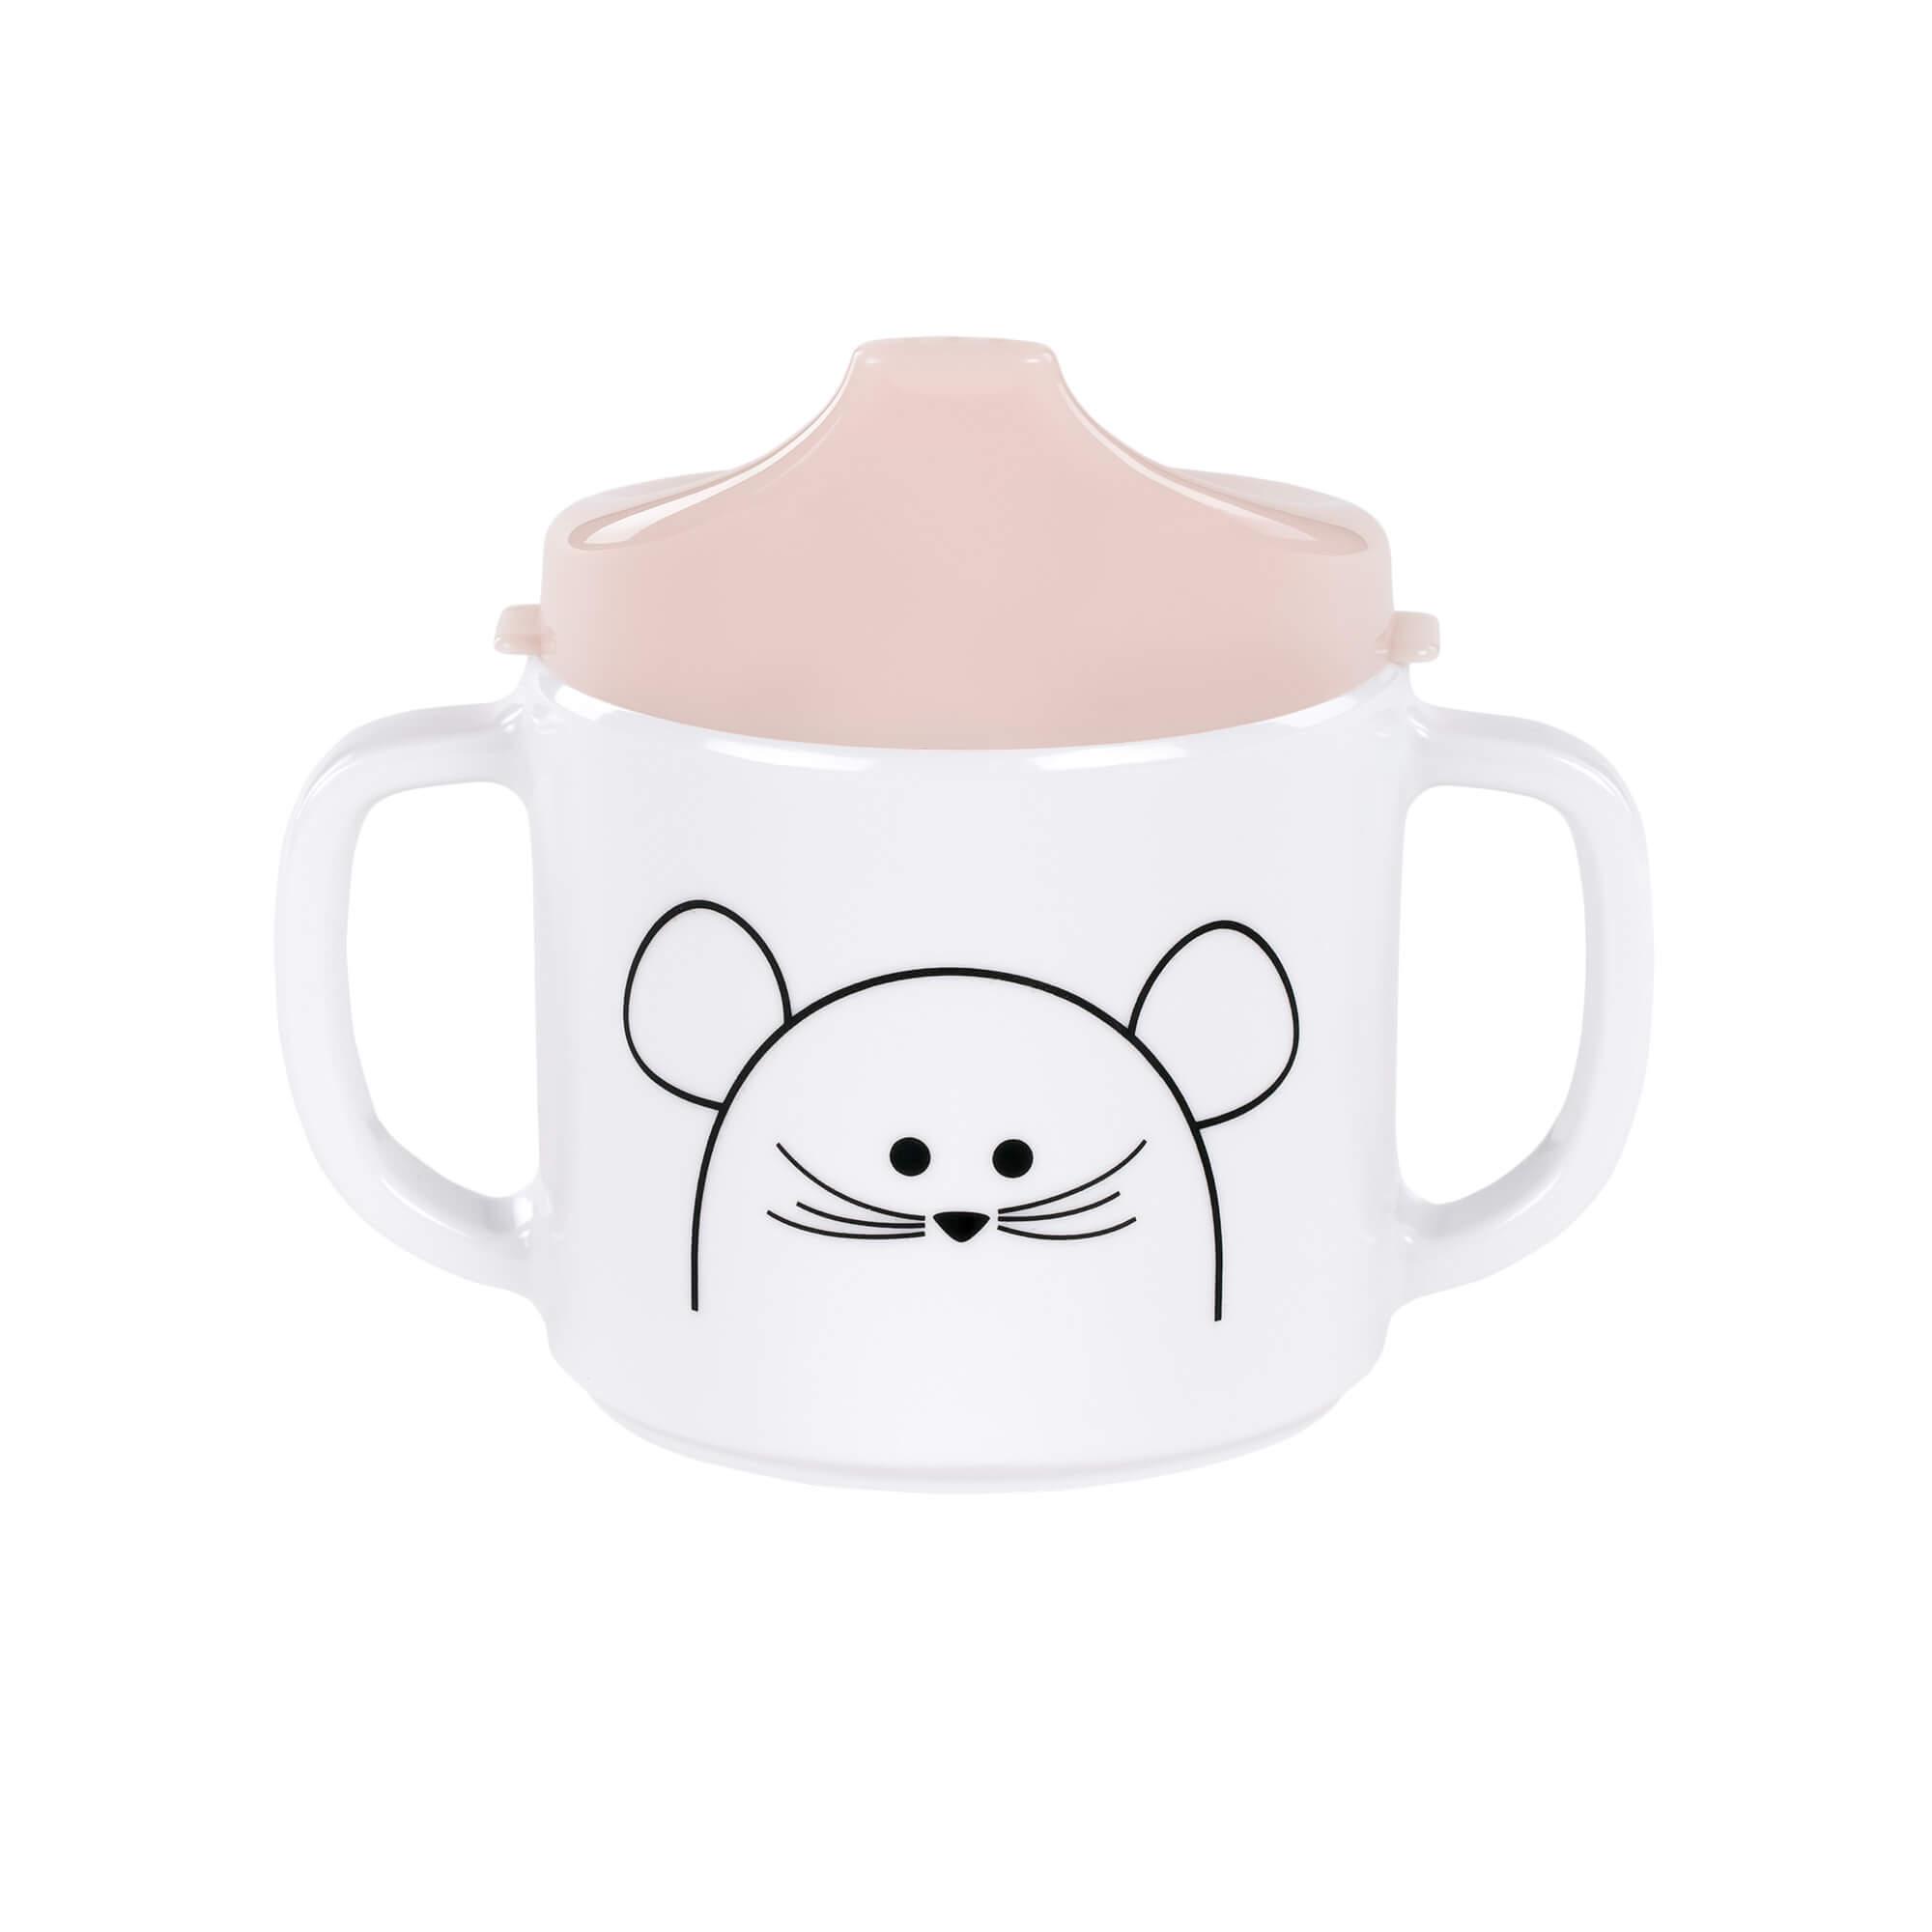 Lässig schnabeltasse dish cup melamine little chums mouse